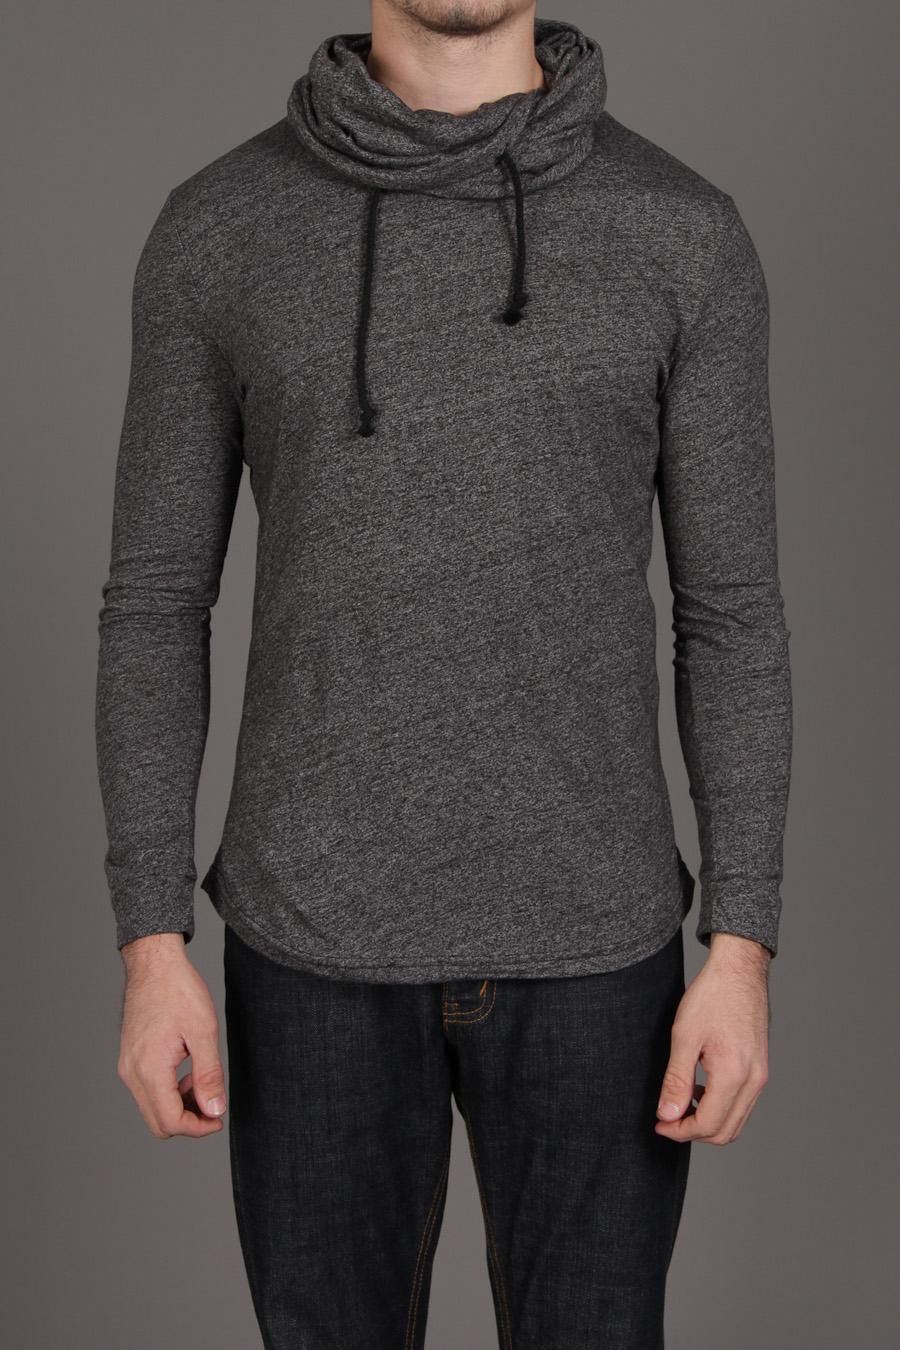 Arsnl Lantern Cowl Collar Lightweight Sweater | chessT | Pinterest ...